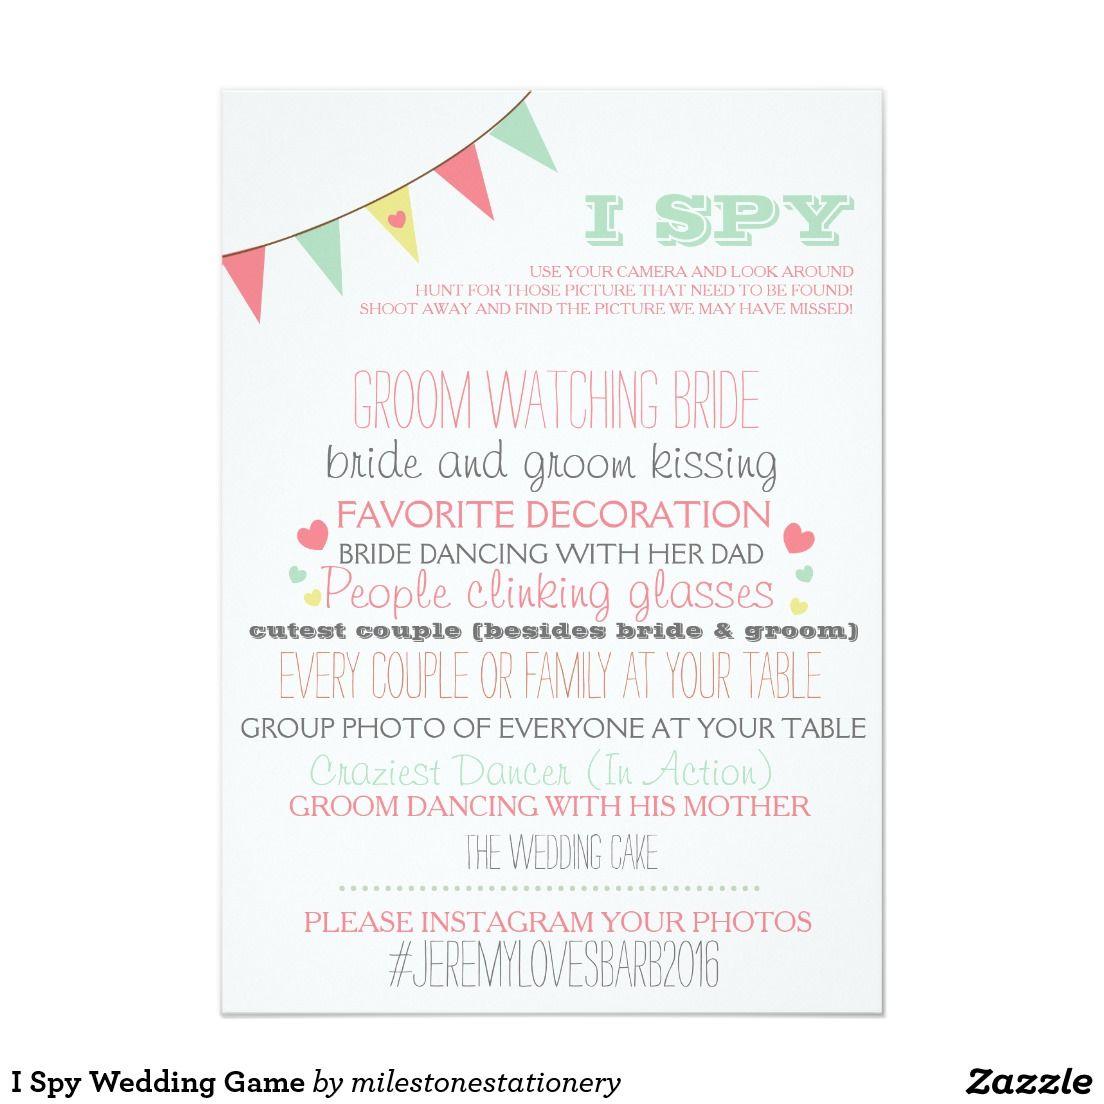 i spy wedding game card weddings pinterest zazzle invitations